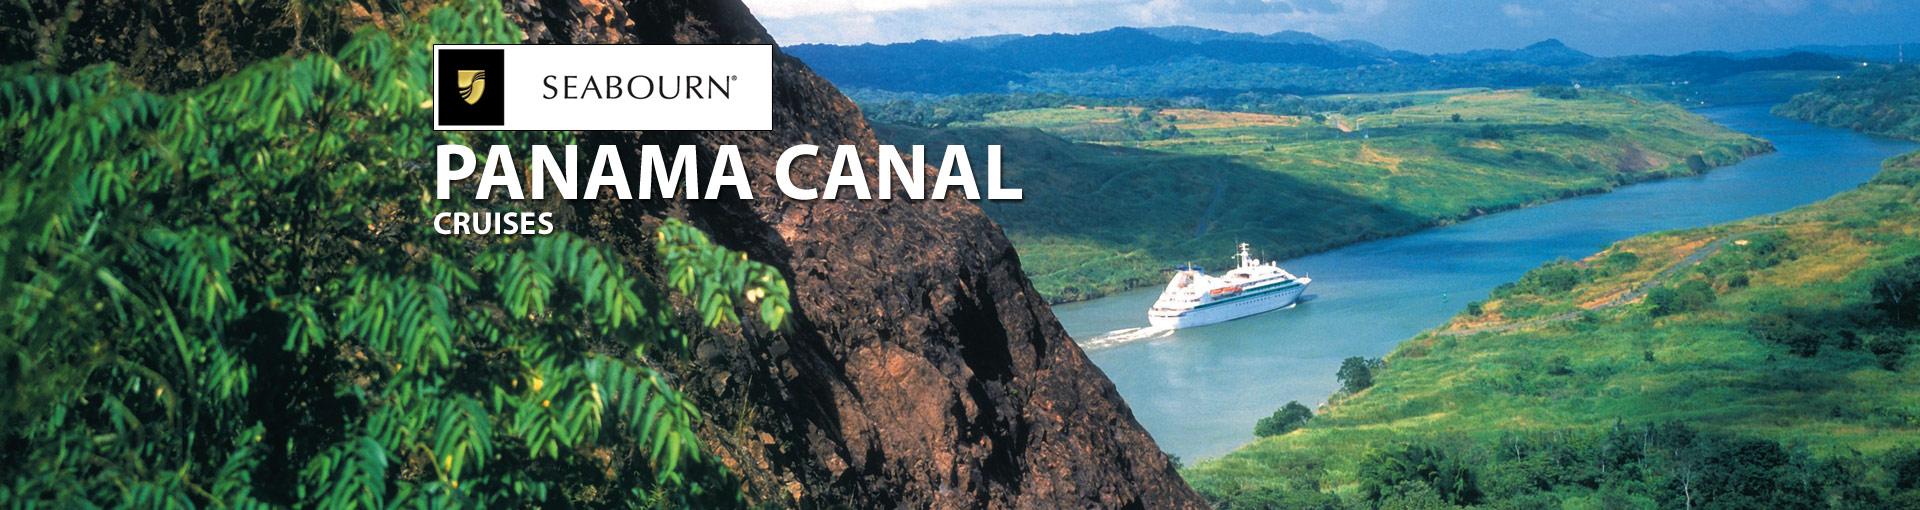 Seabourn Cruise Line Panama Canal Cruises